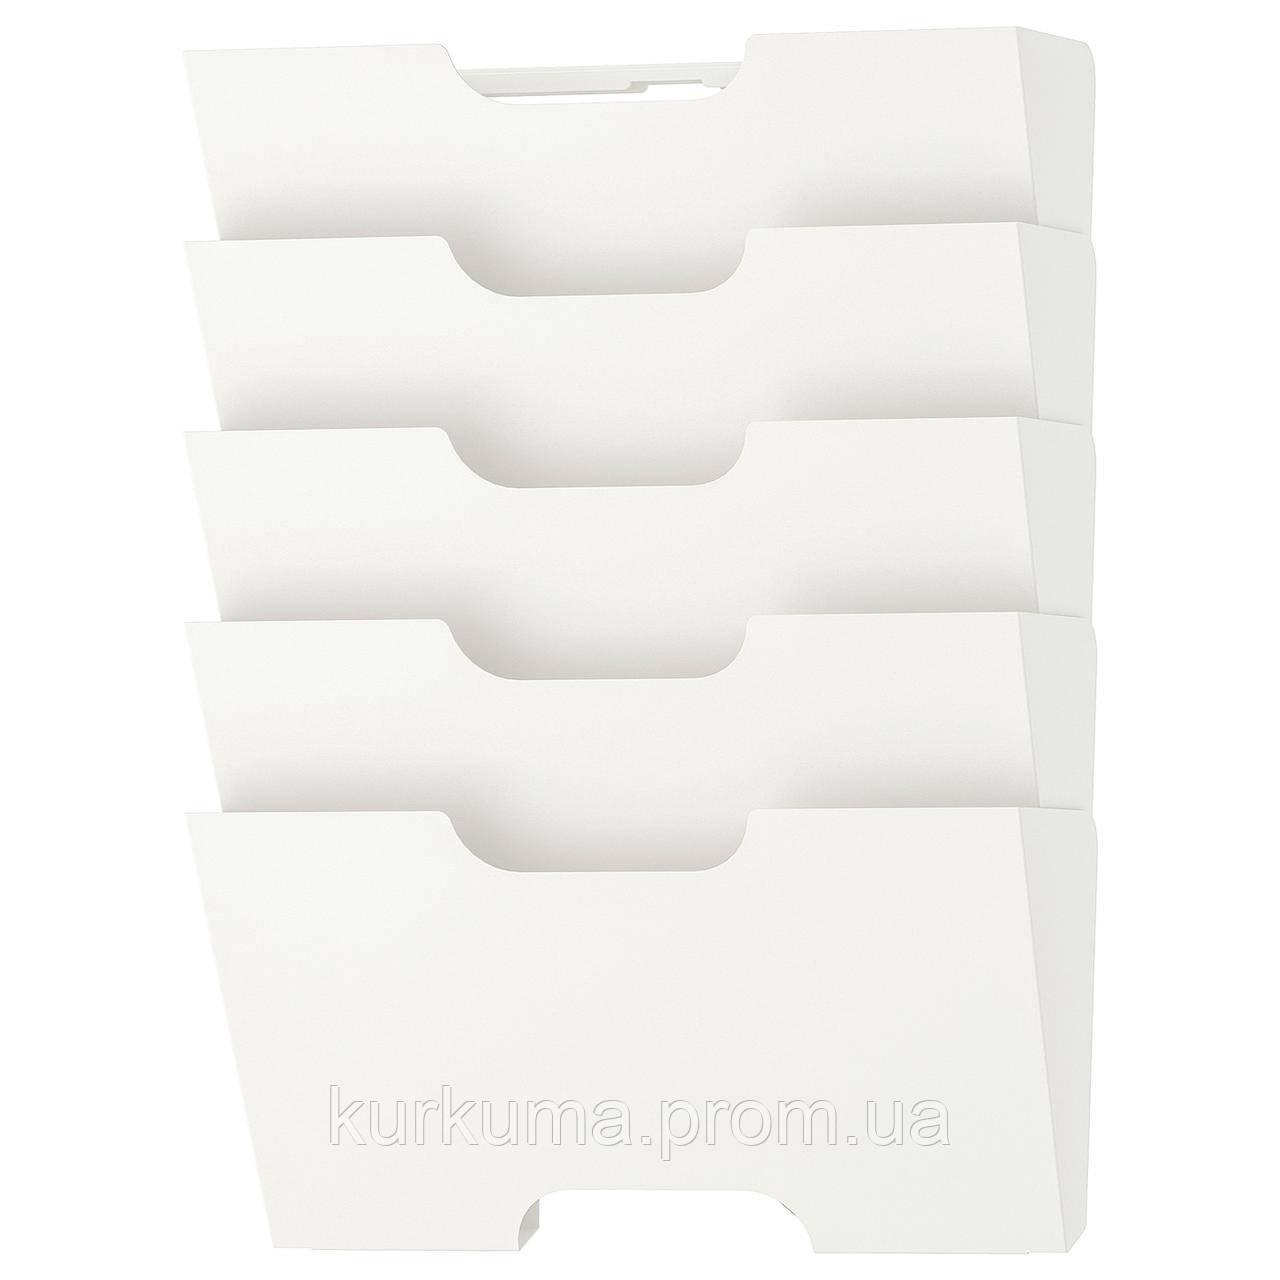 IKEA KVISSLE Настенная полка для газет, белая (901.980.30)